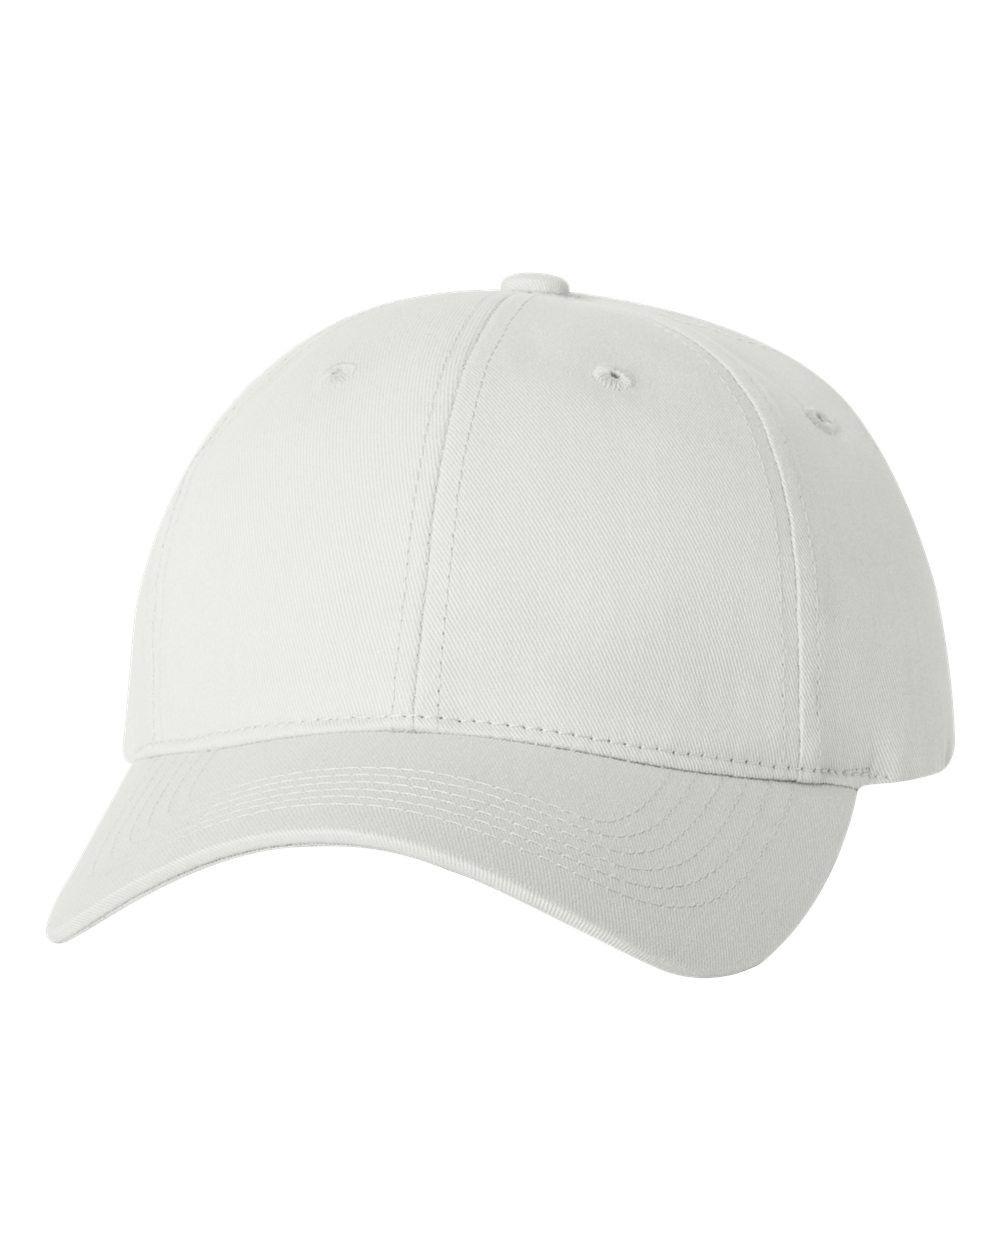 Sportsman - Twill Cap with Velcro Closure - 2260 White